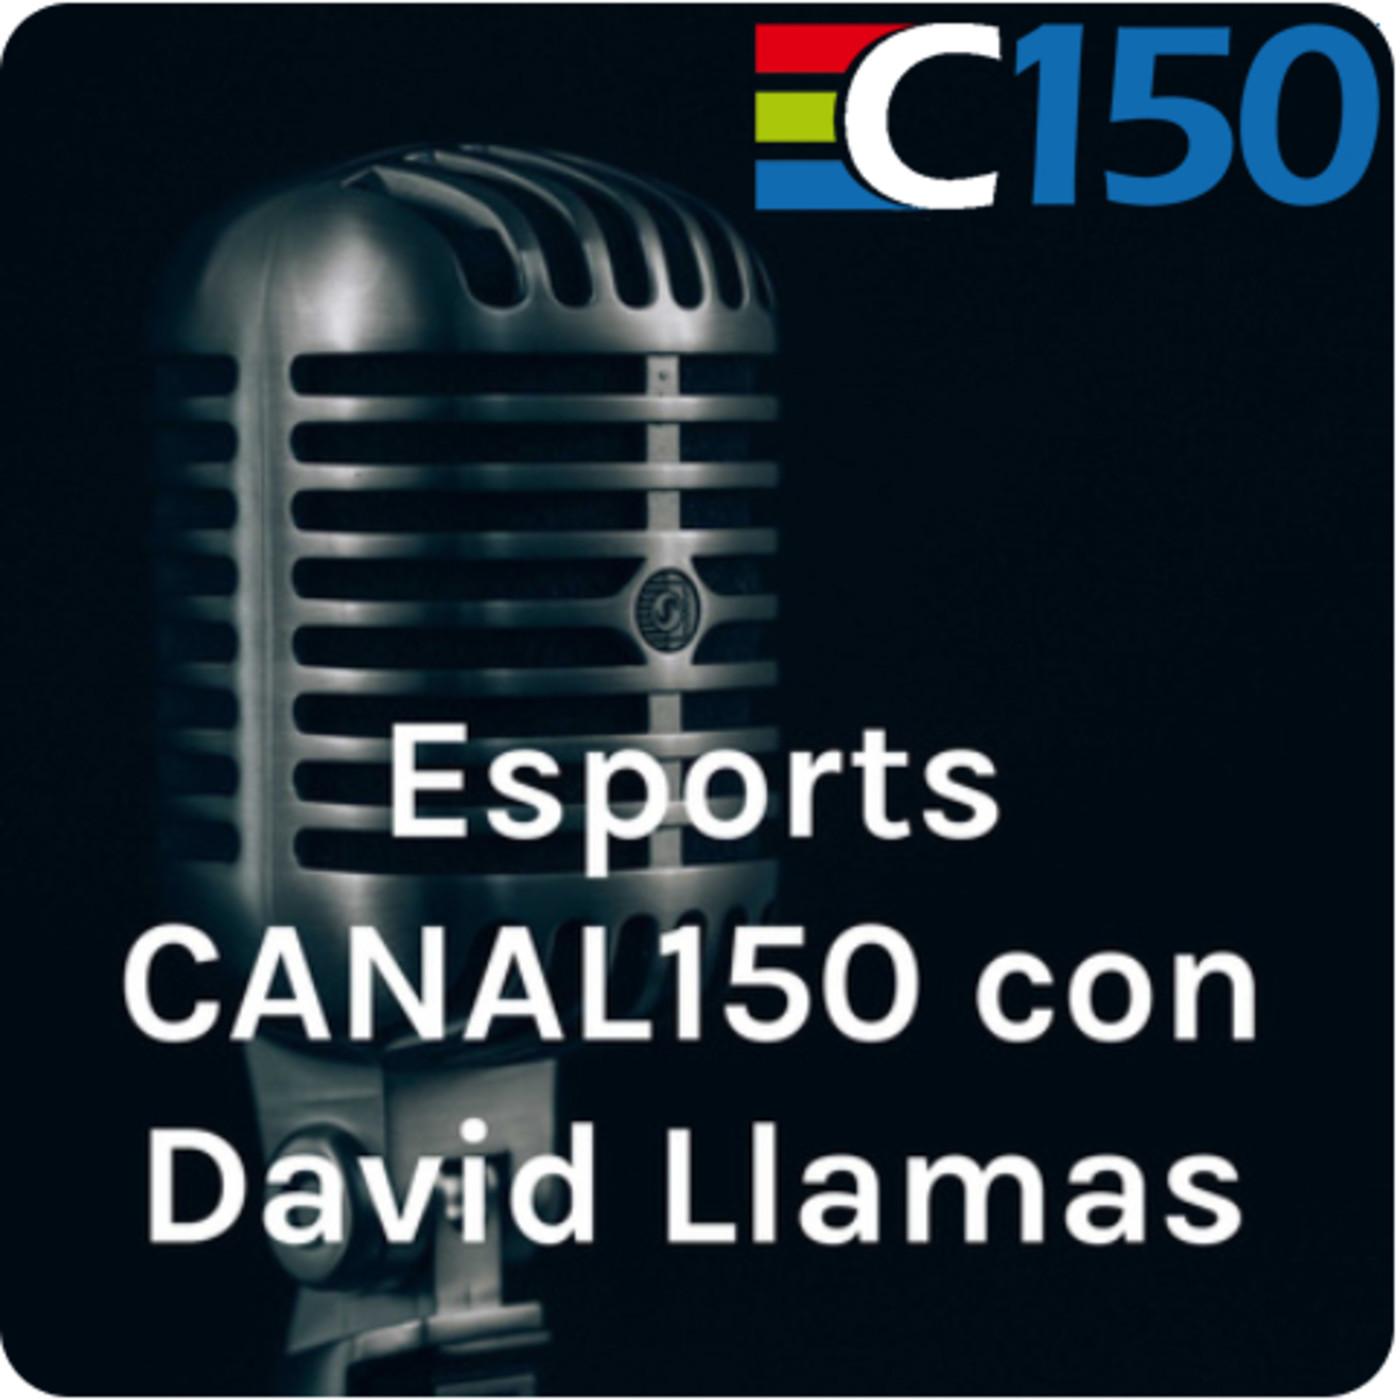 Octubre 2020 - Esports CANAL150 con David Llamas